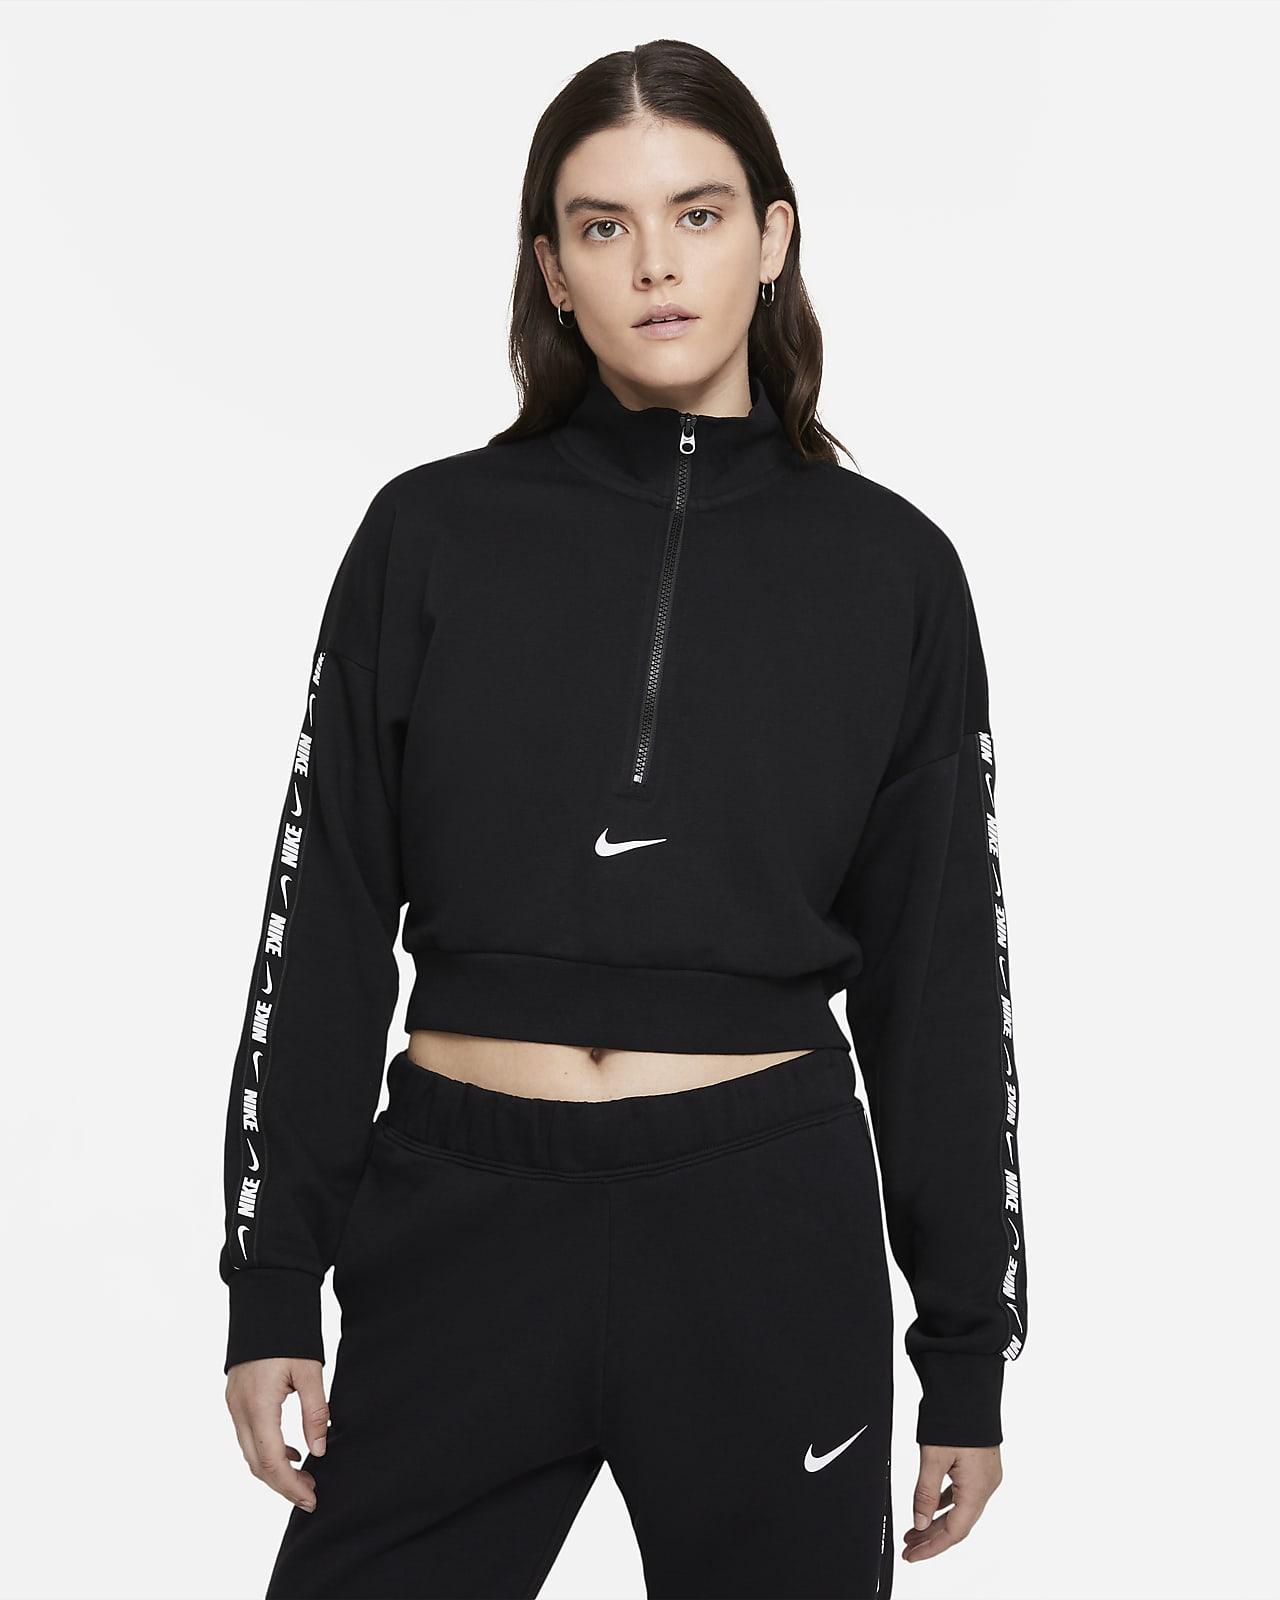 Женская укороченная флисовая футболка Nike Sportswear Essential